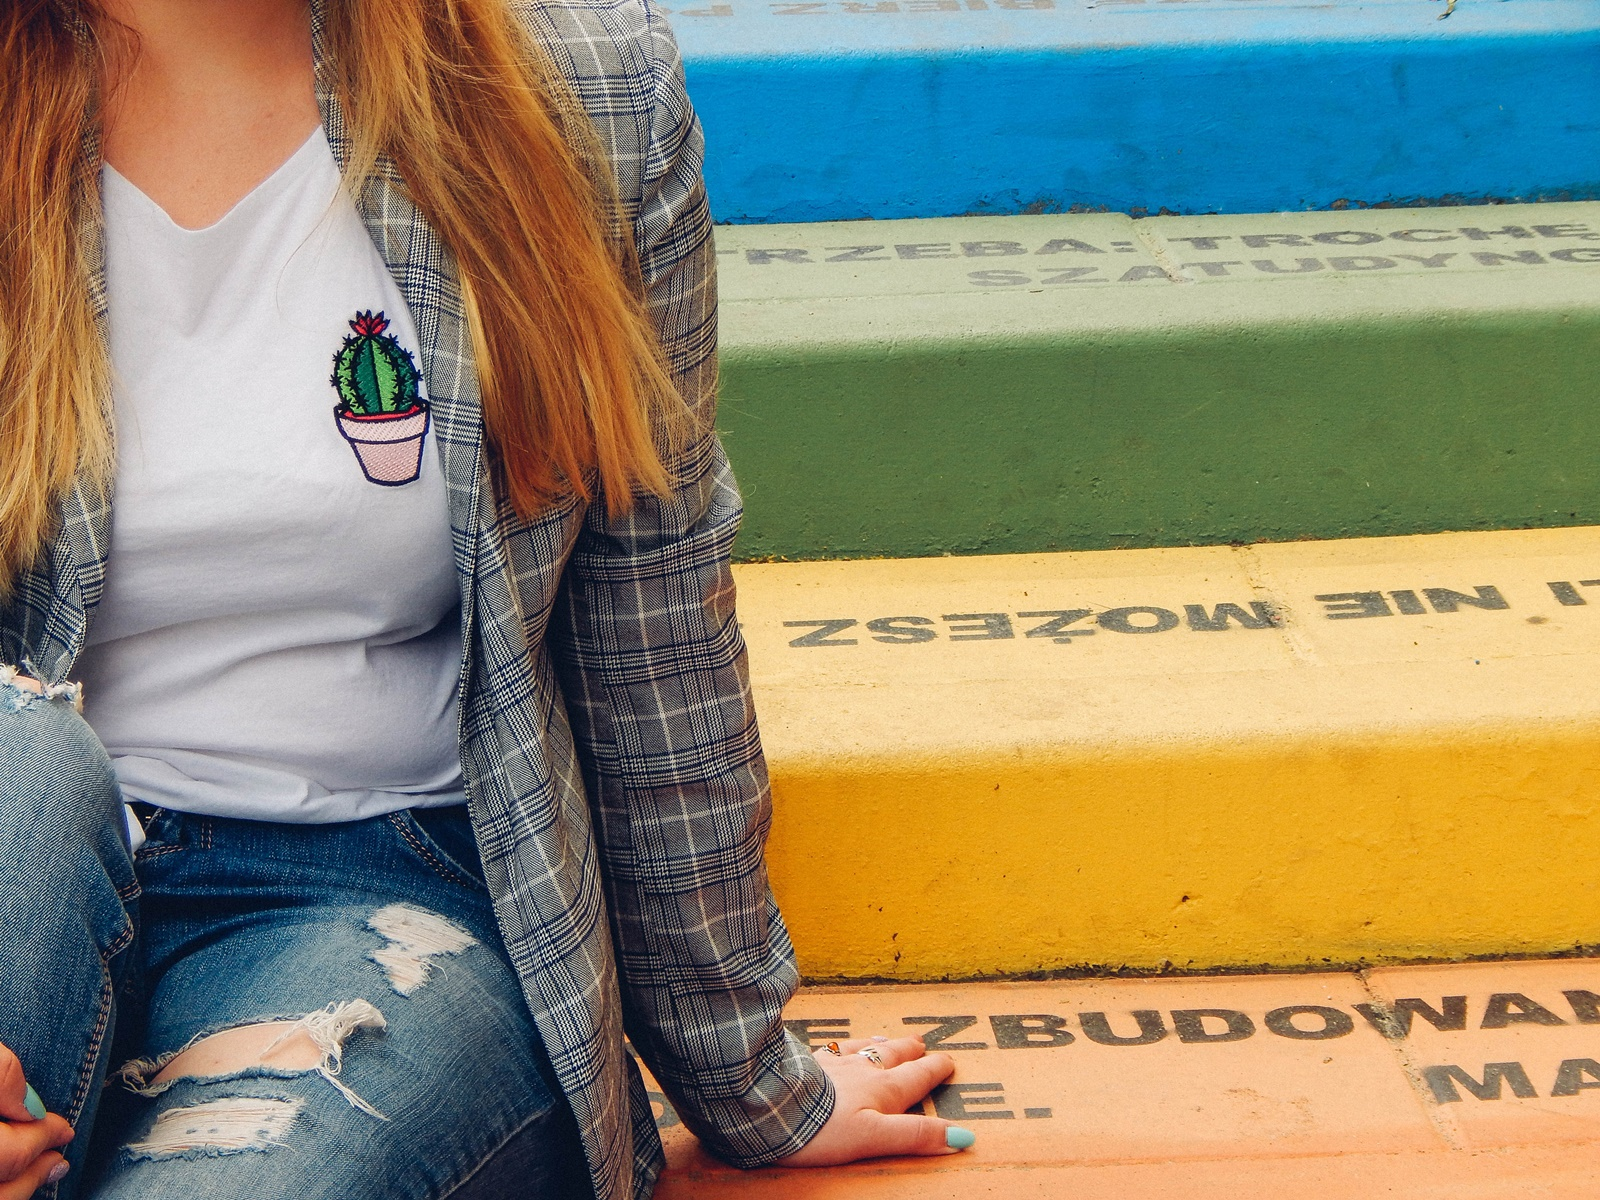 1 nakd zniżka outfit moda blog modowy jak nosić marynarkę w kratkę tshirt z kaktusem jak nosić podarte jeansy vansy moda streetwear style fashion outfit blog lifestyle łódź